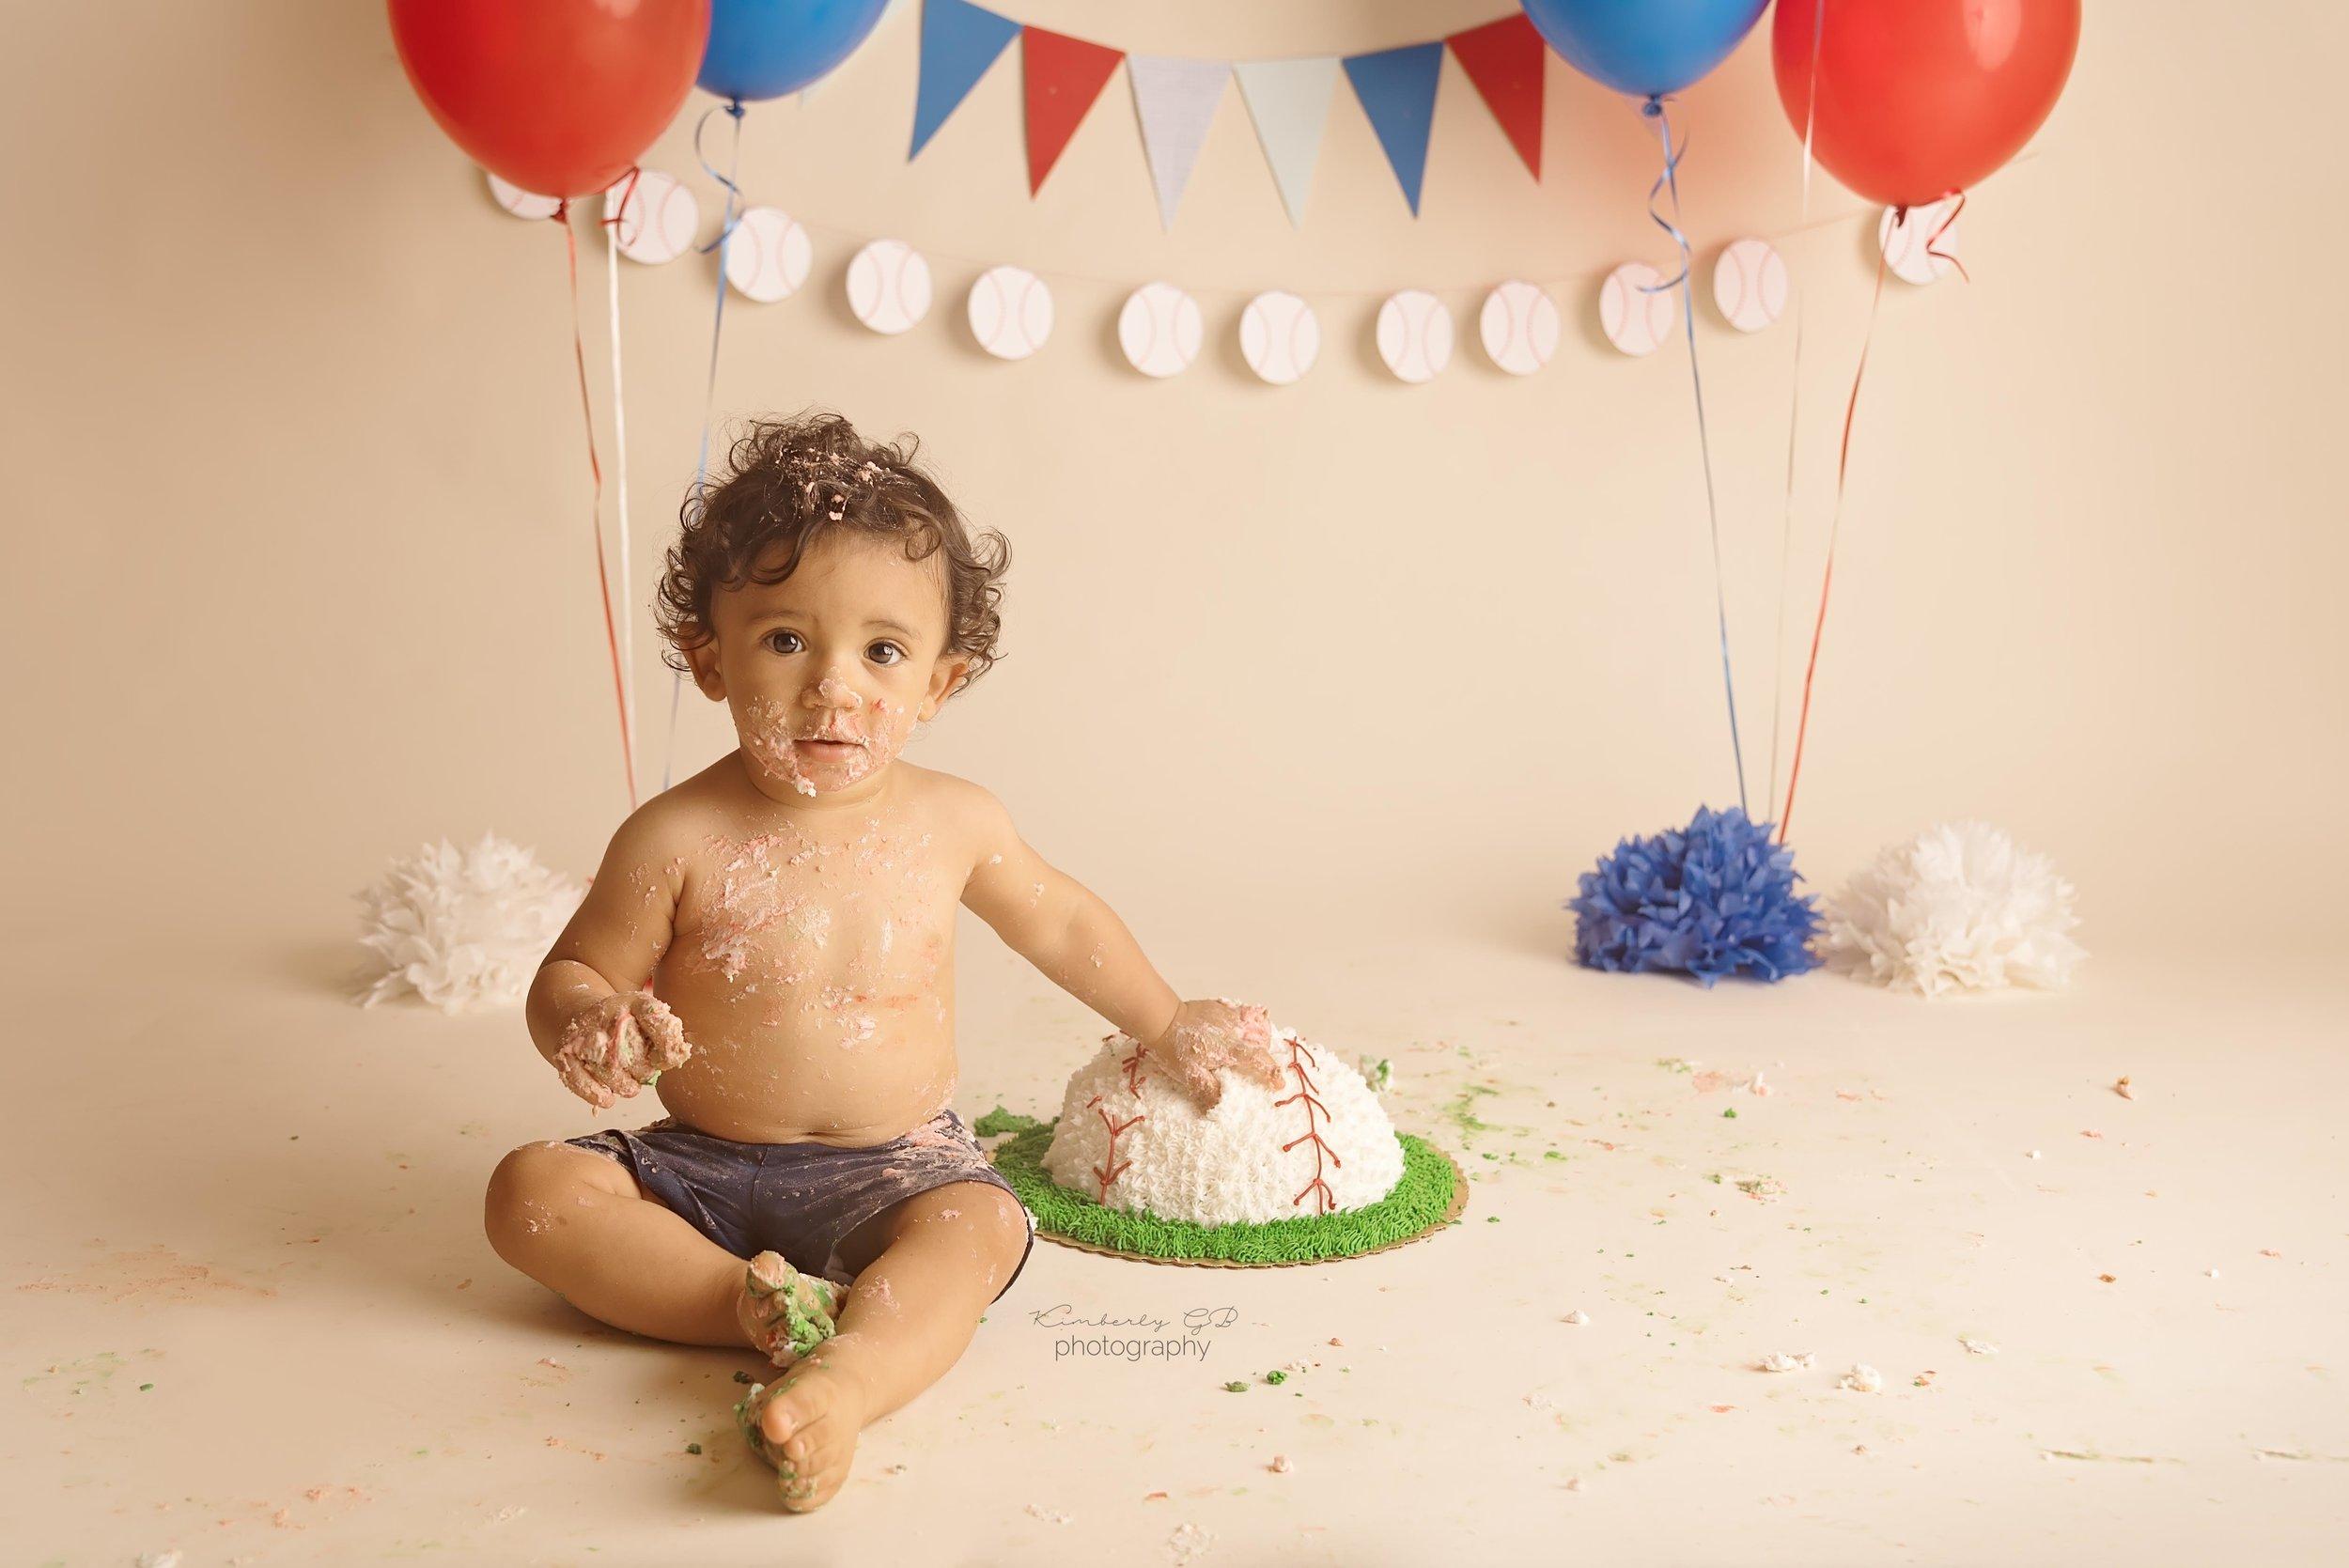 fotografia-de-ninos-primer-ano-anito-cake-smash-bizcocho-en-puerto-rico-kimberly-gb-photography-fotografa-42.jpg